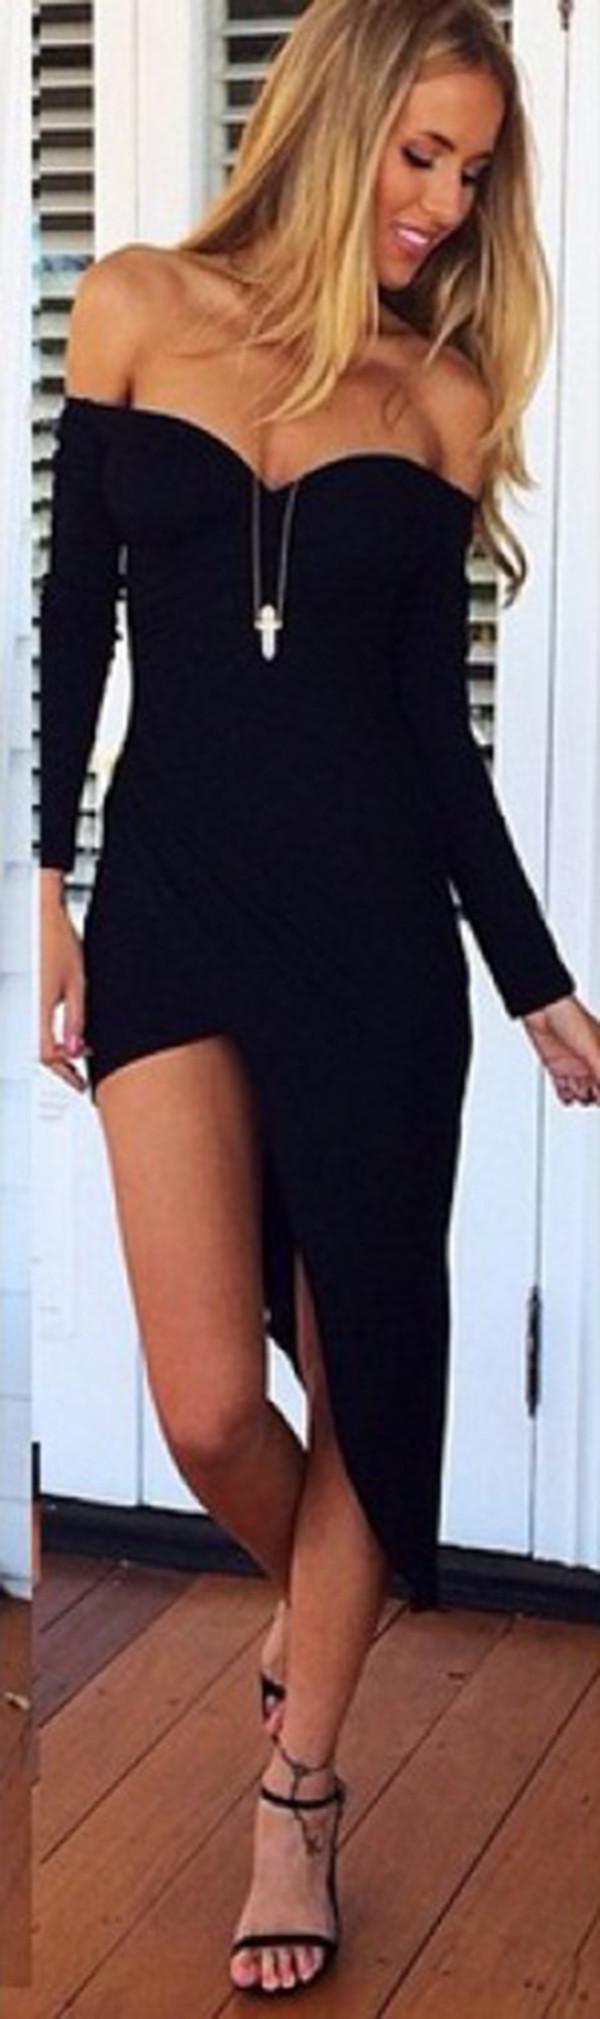 asymmetric dress asymmetrical dress draped dress high low dress sweetheart neckline draped dress off the shoulder dress off shoulder draped dress off shoulder asymmetrical dress dress